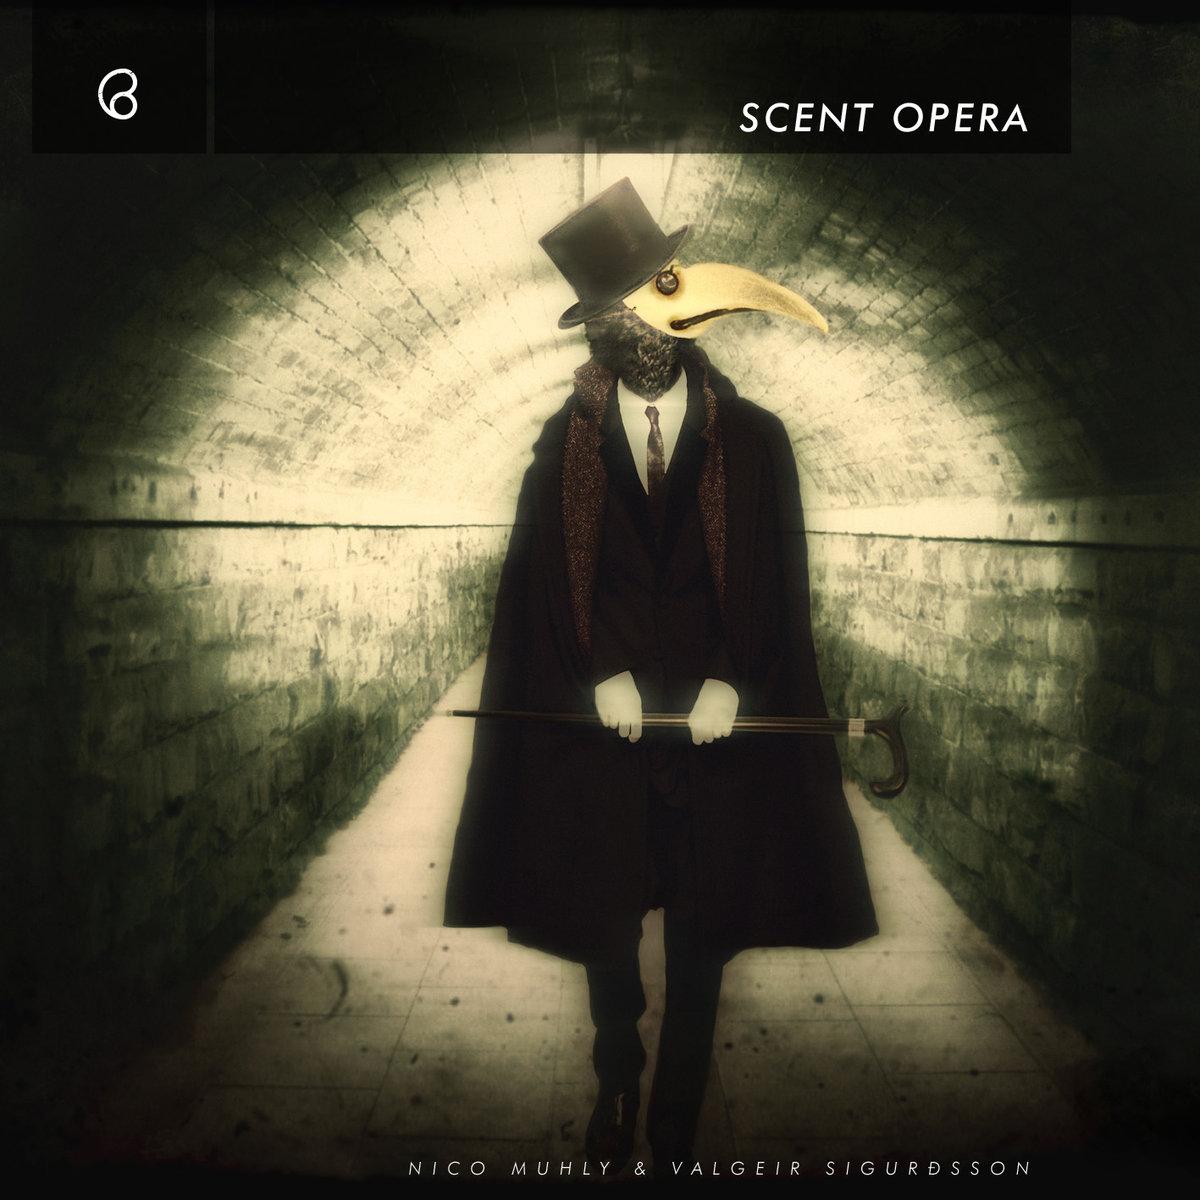 Scent Opera